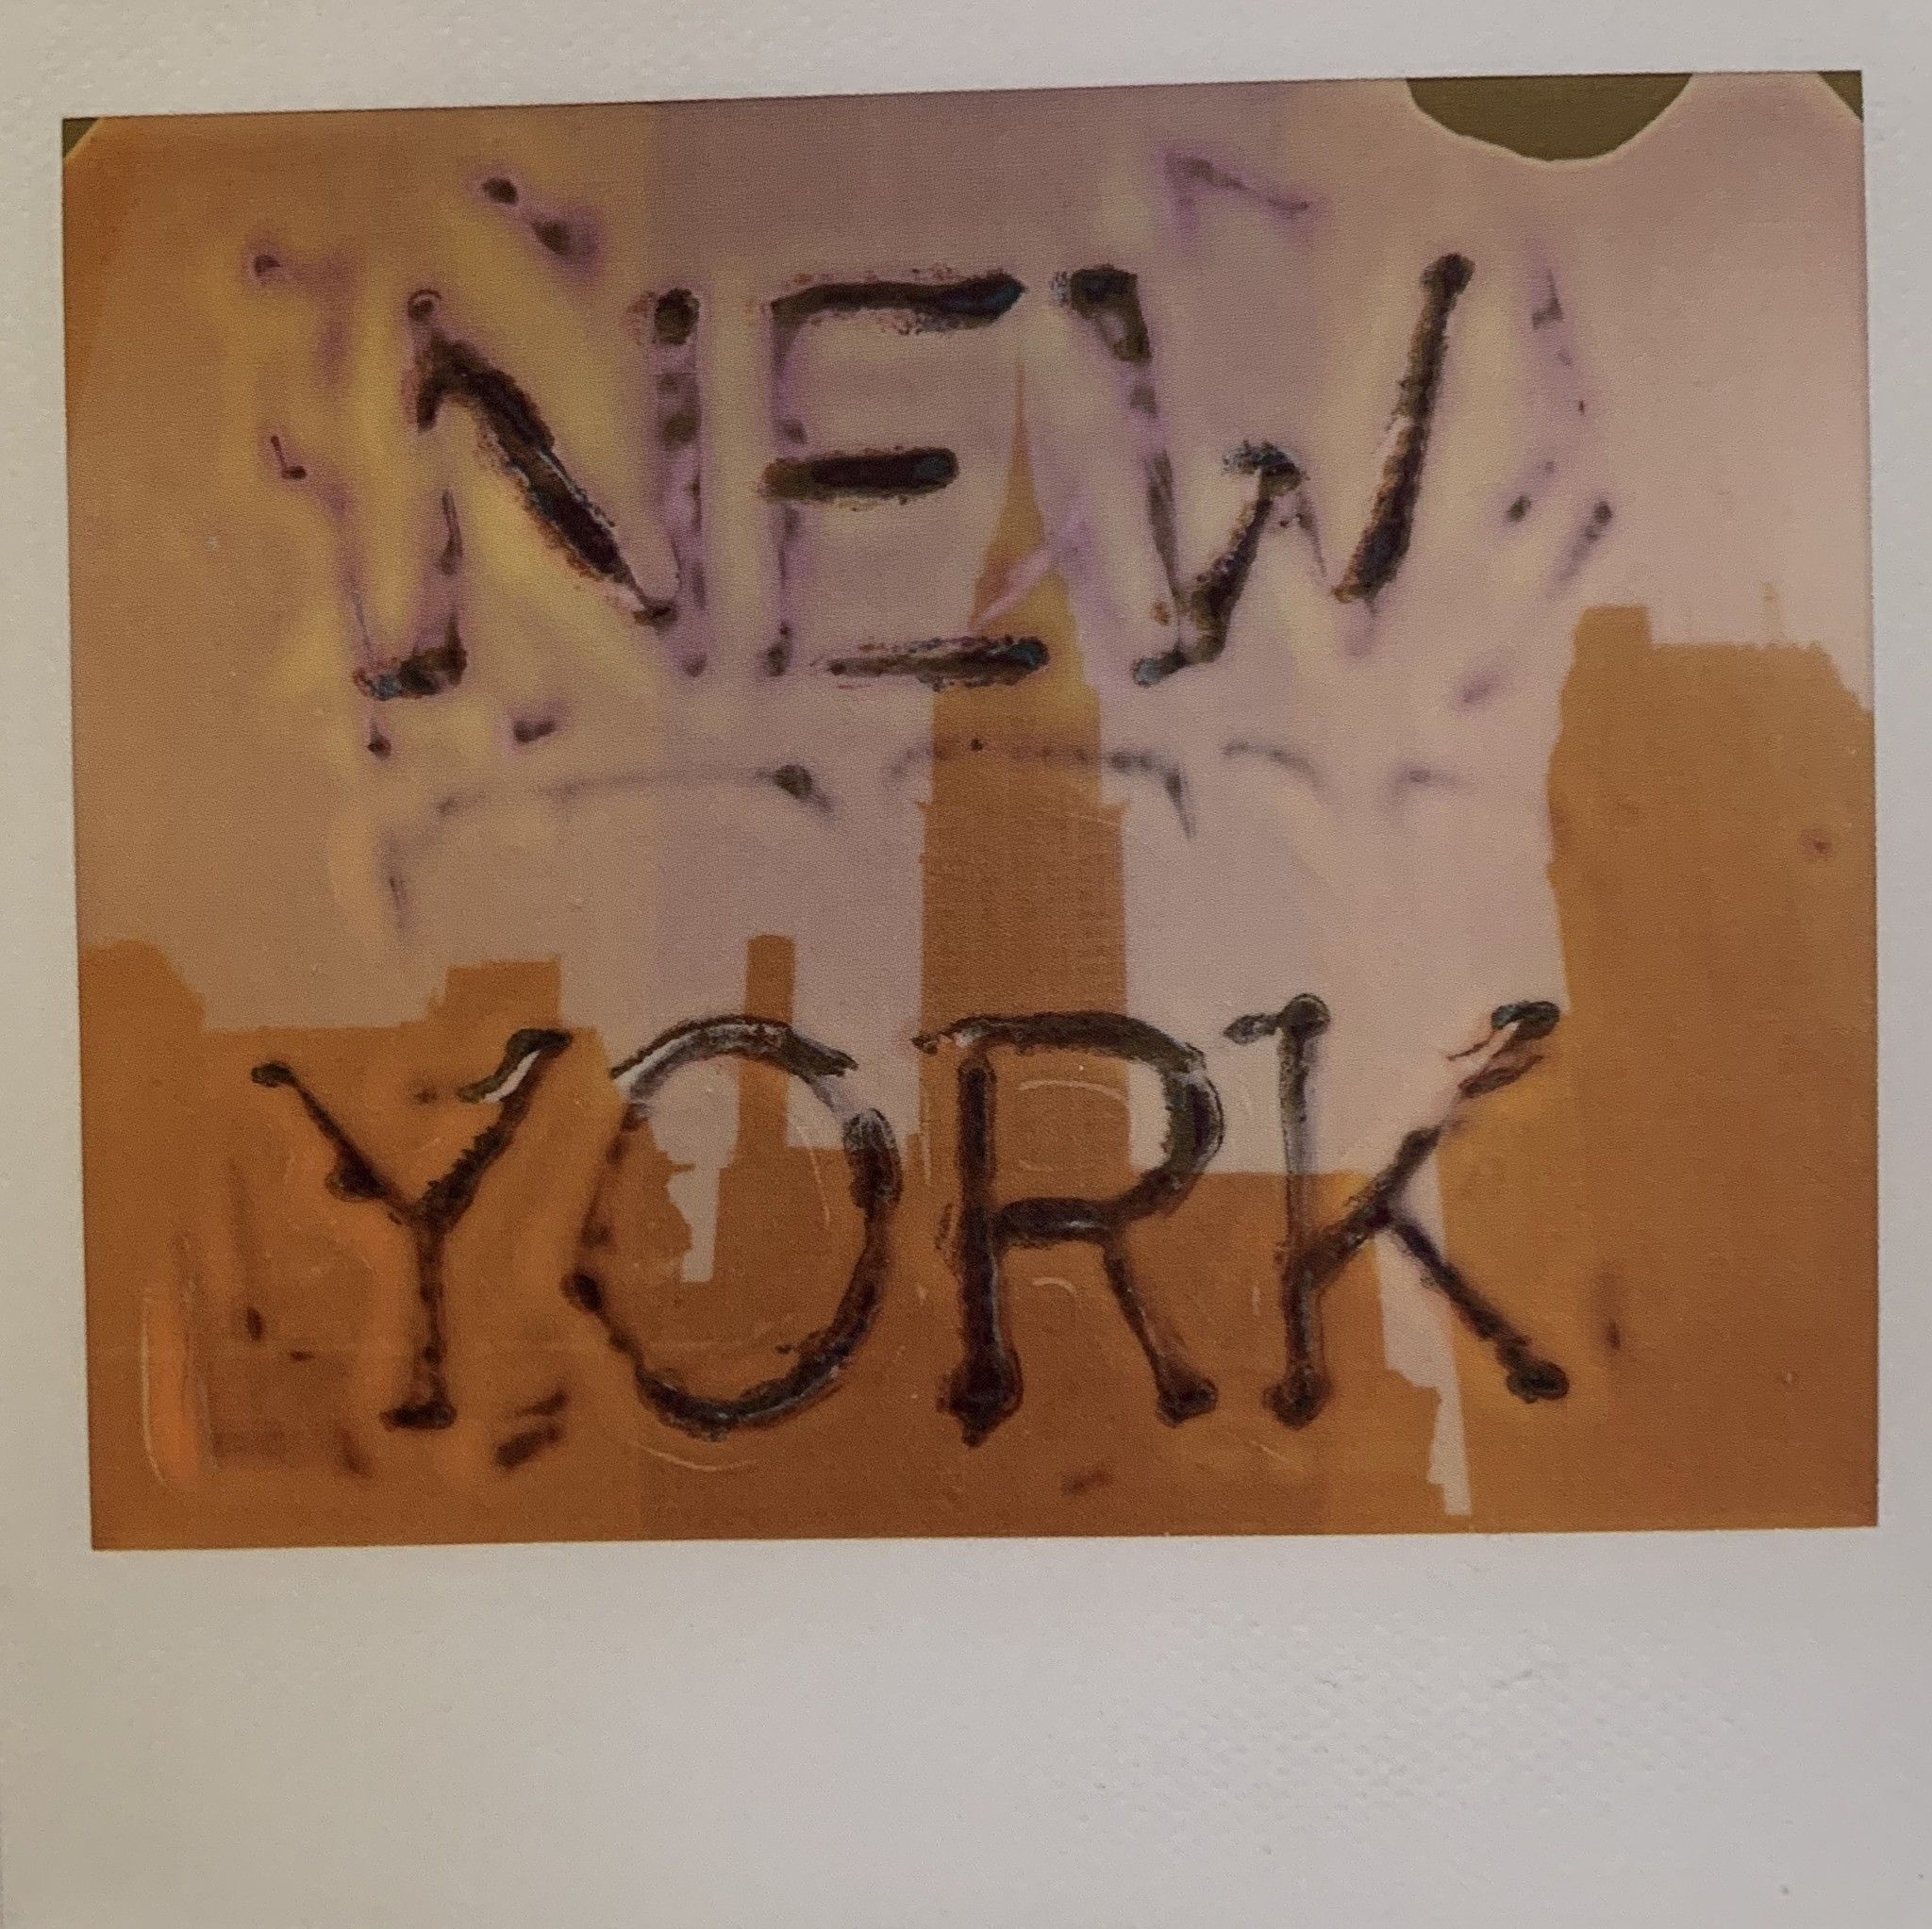 VINTAGE POLAROID MAURIZIO GALIMBERTI 'NEW YORK' dimensioni cm. 34x34